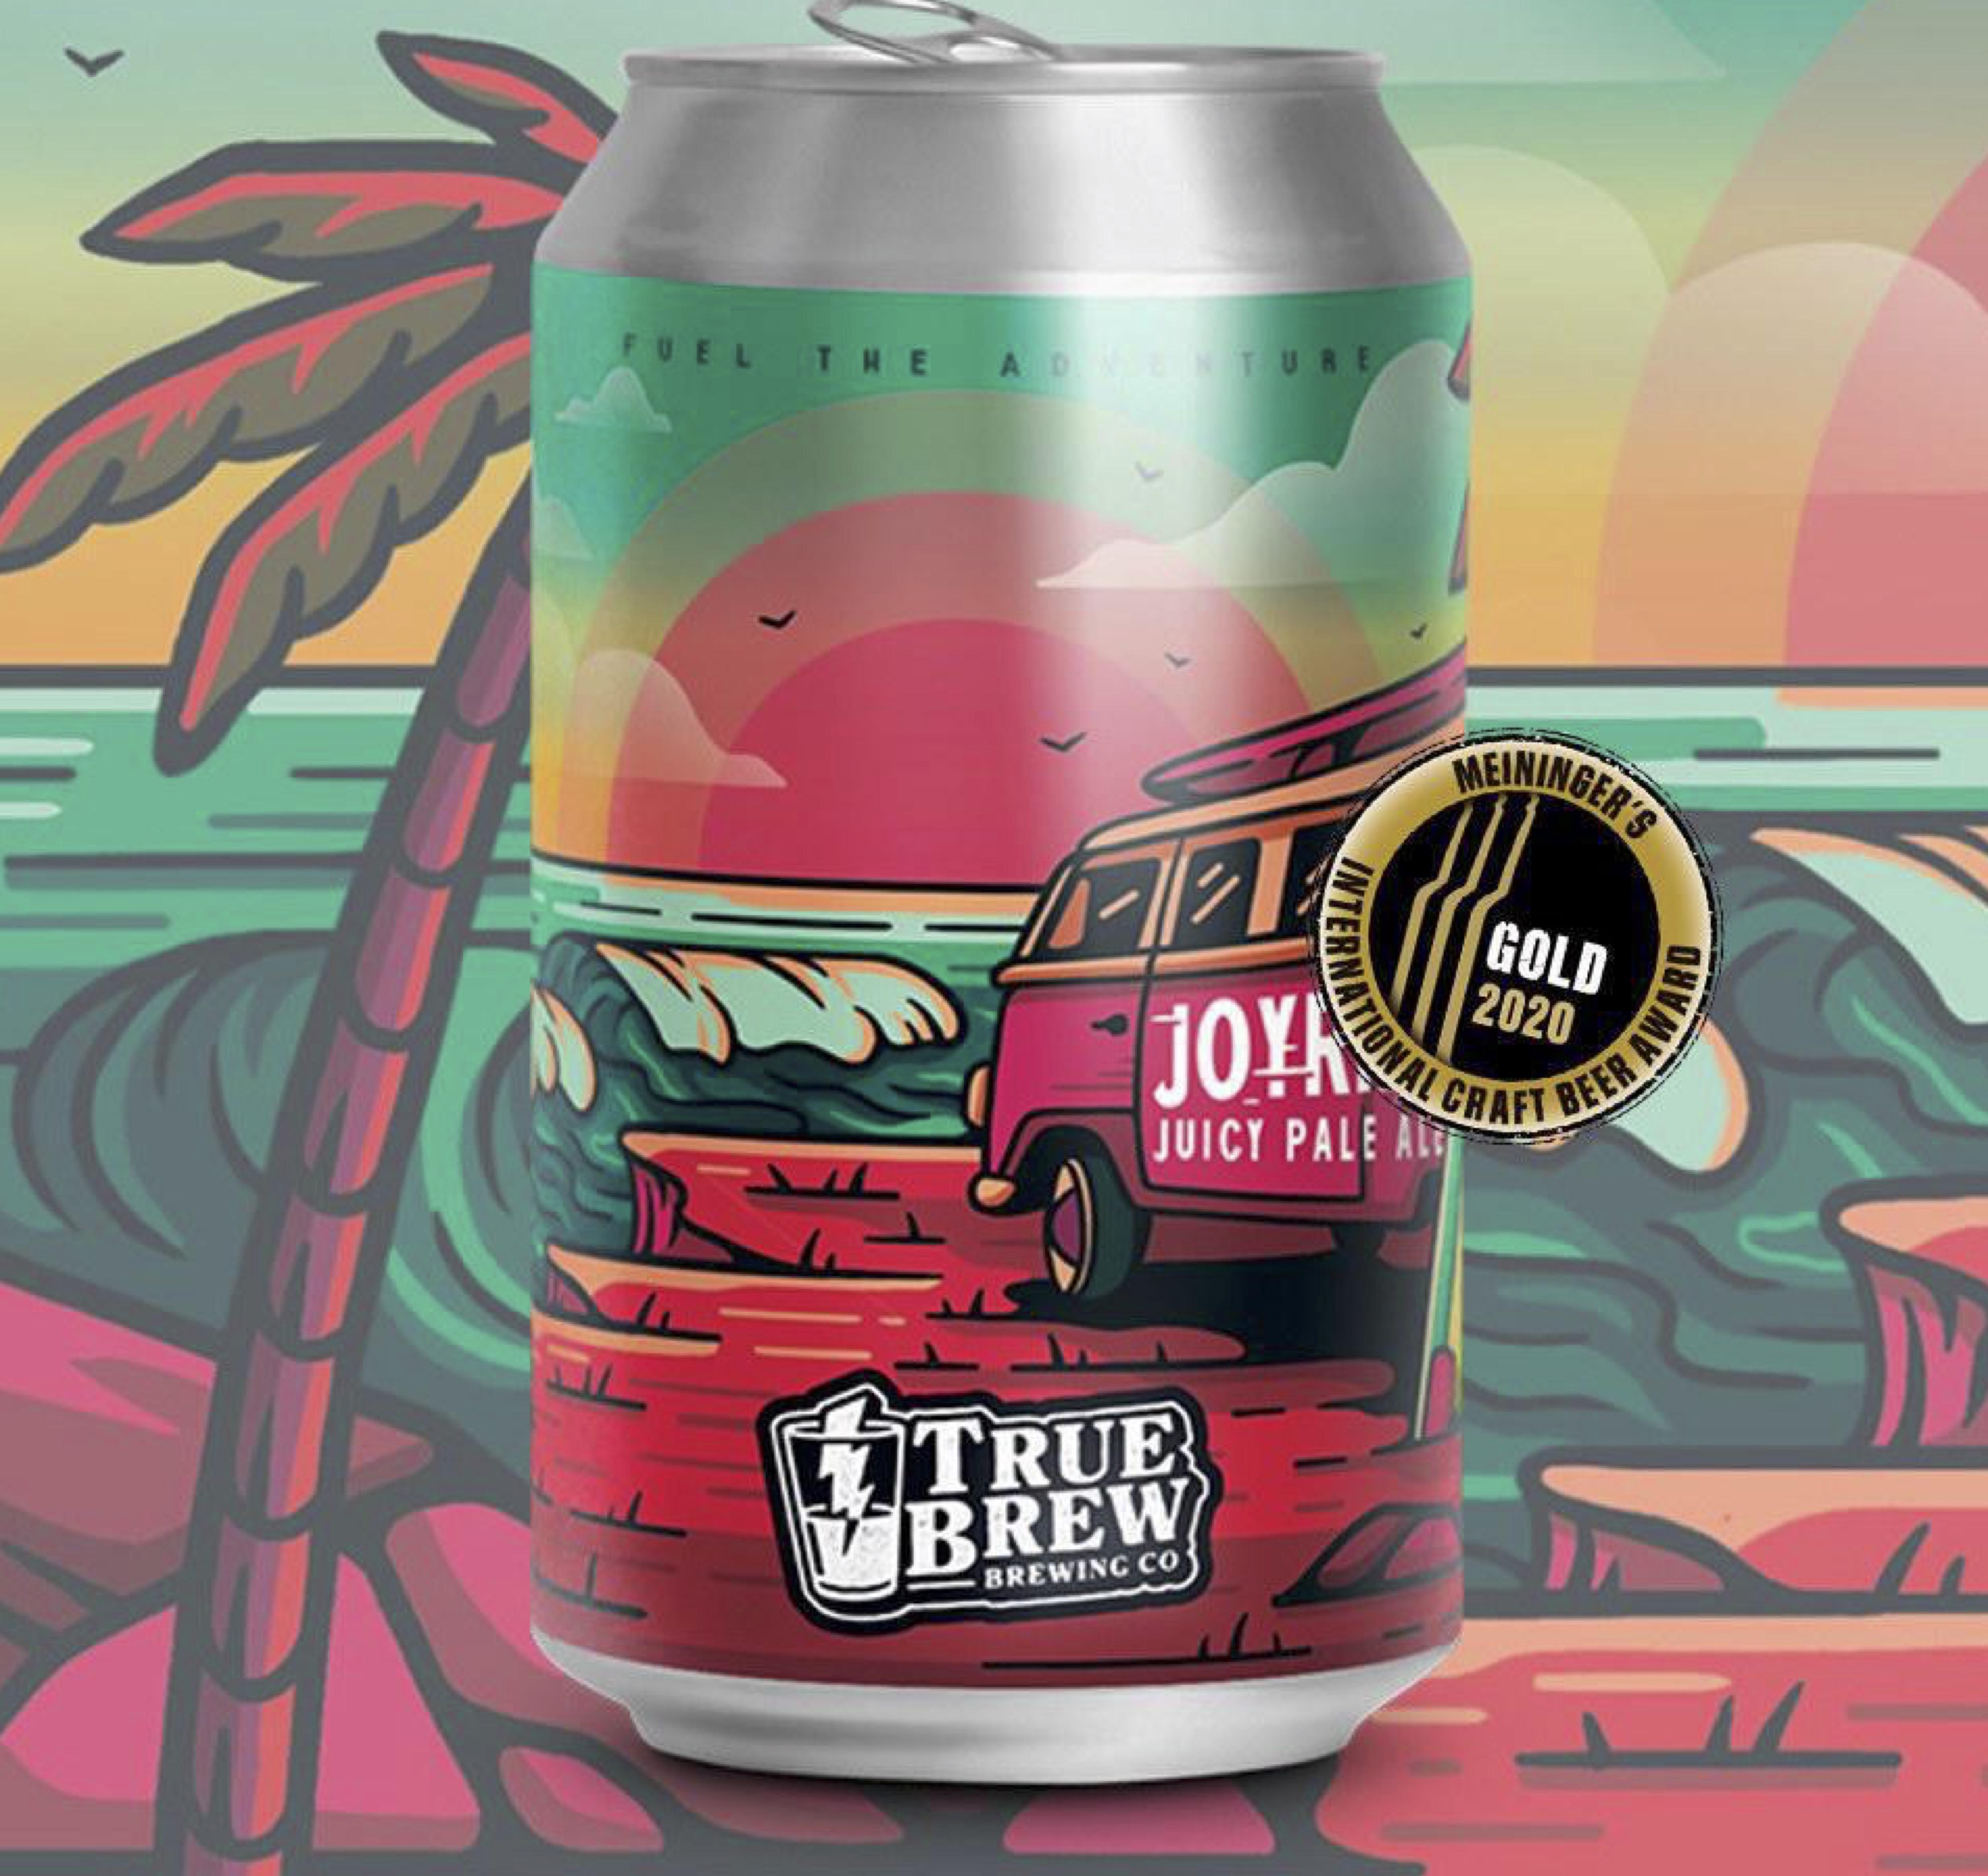 True Brew - Joyride Juicy Pale Ale 5.2% 330 can